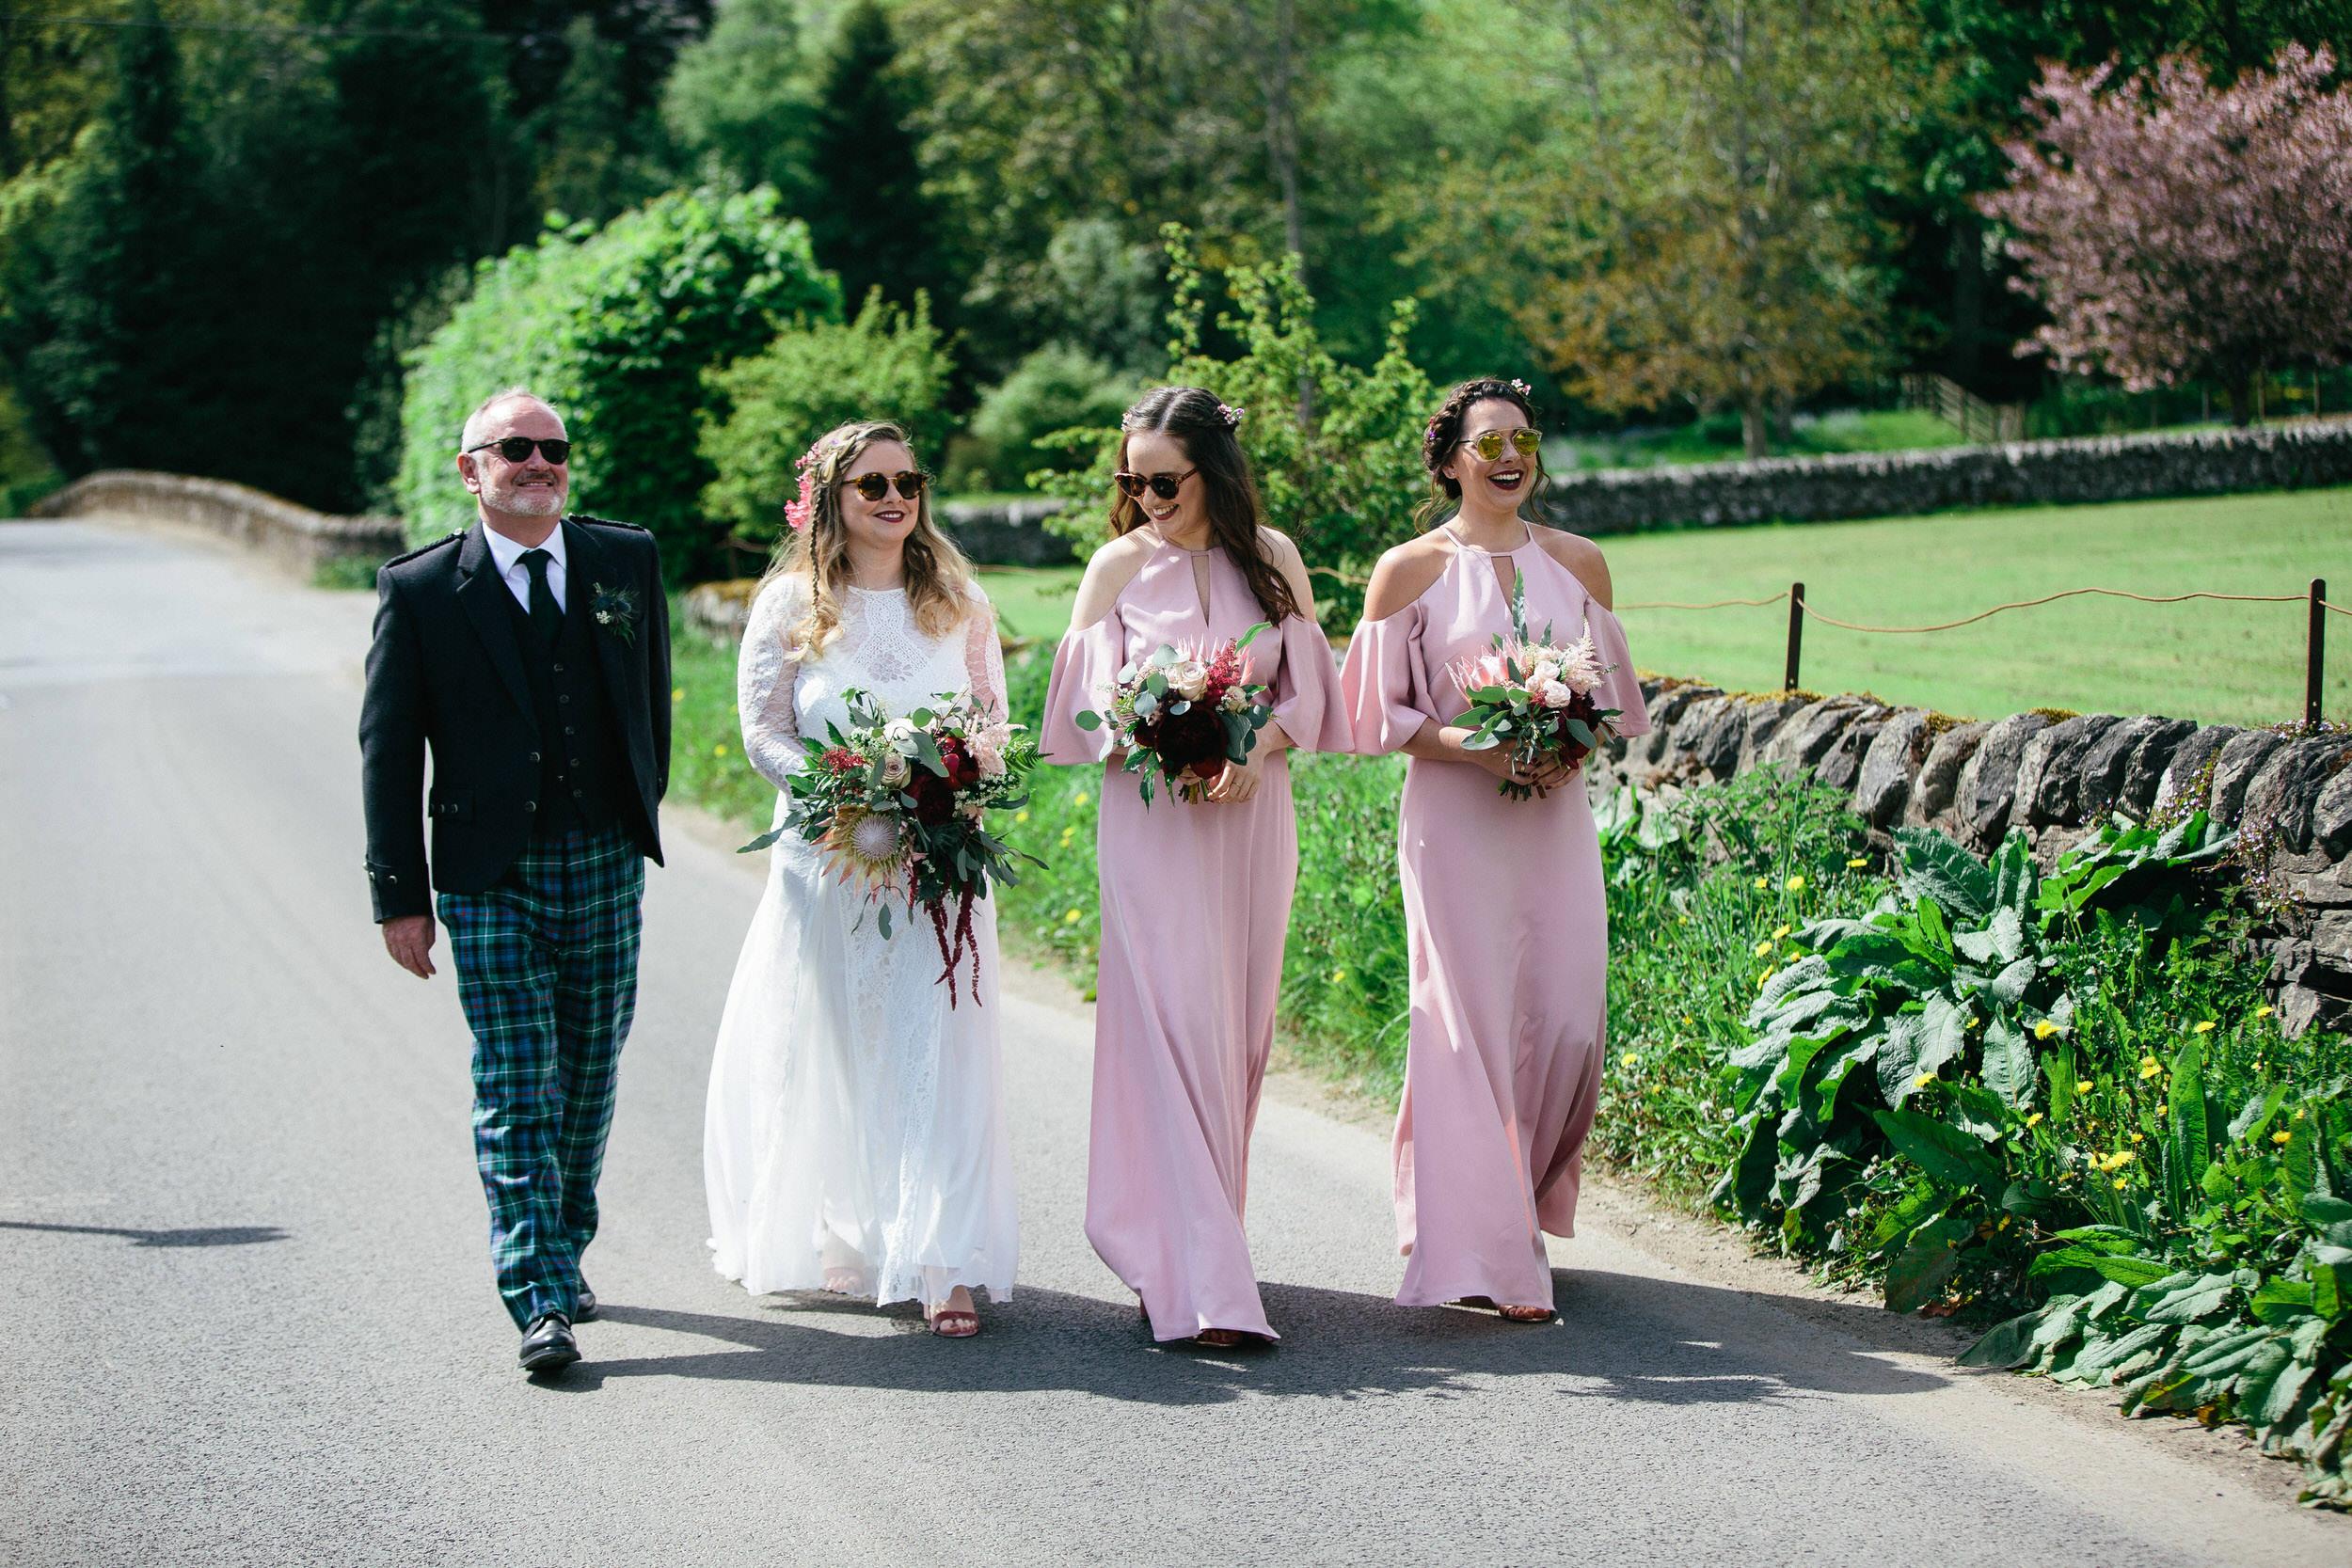 Quirky Wedding Photographer Scotland Glasgow Edinburgh Mirrorbox 013.jpg